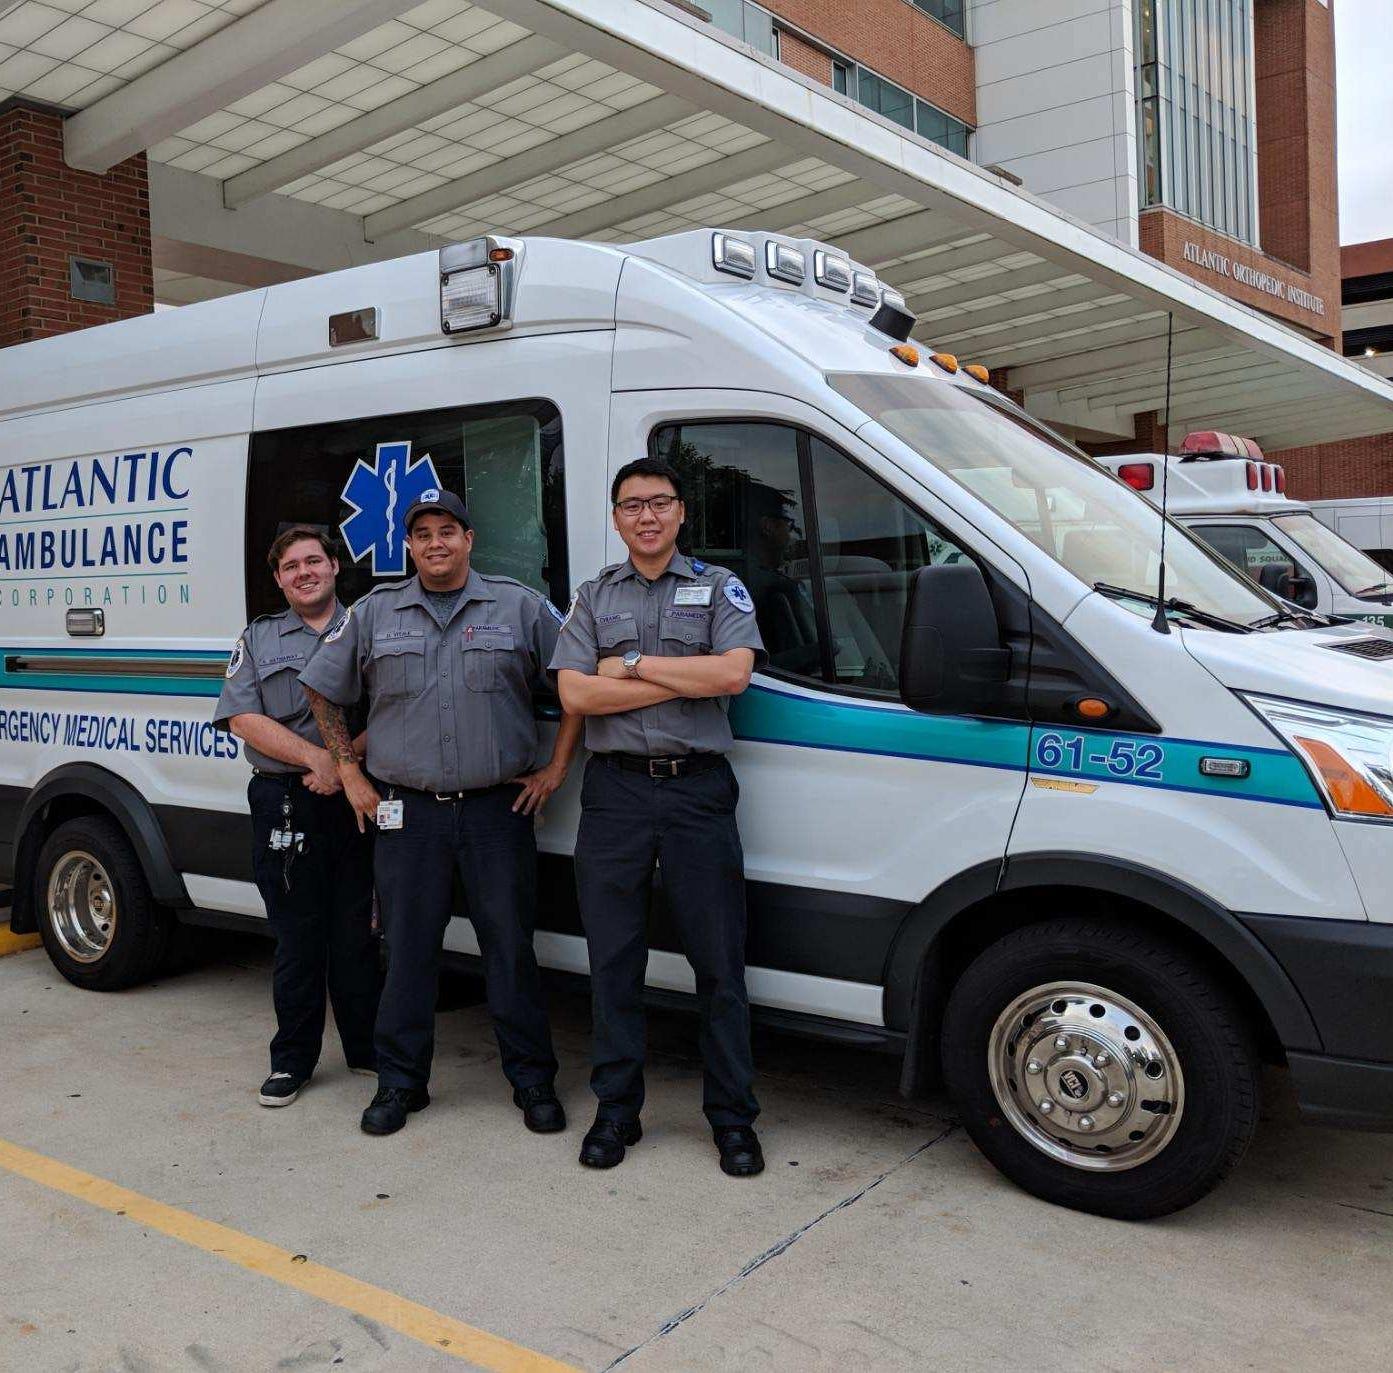 Hurricane Florence: Bridgewater paramedic team responds in South Carolina